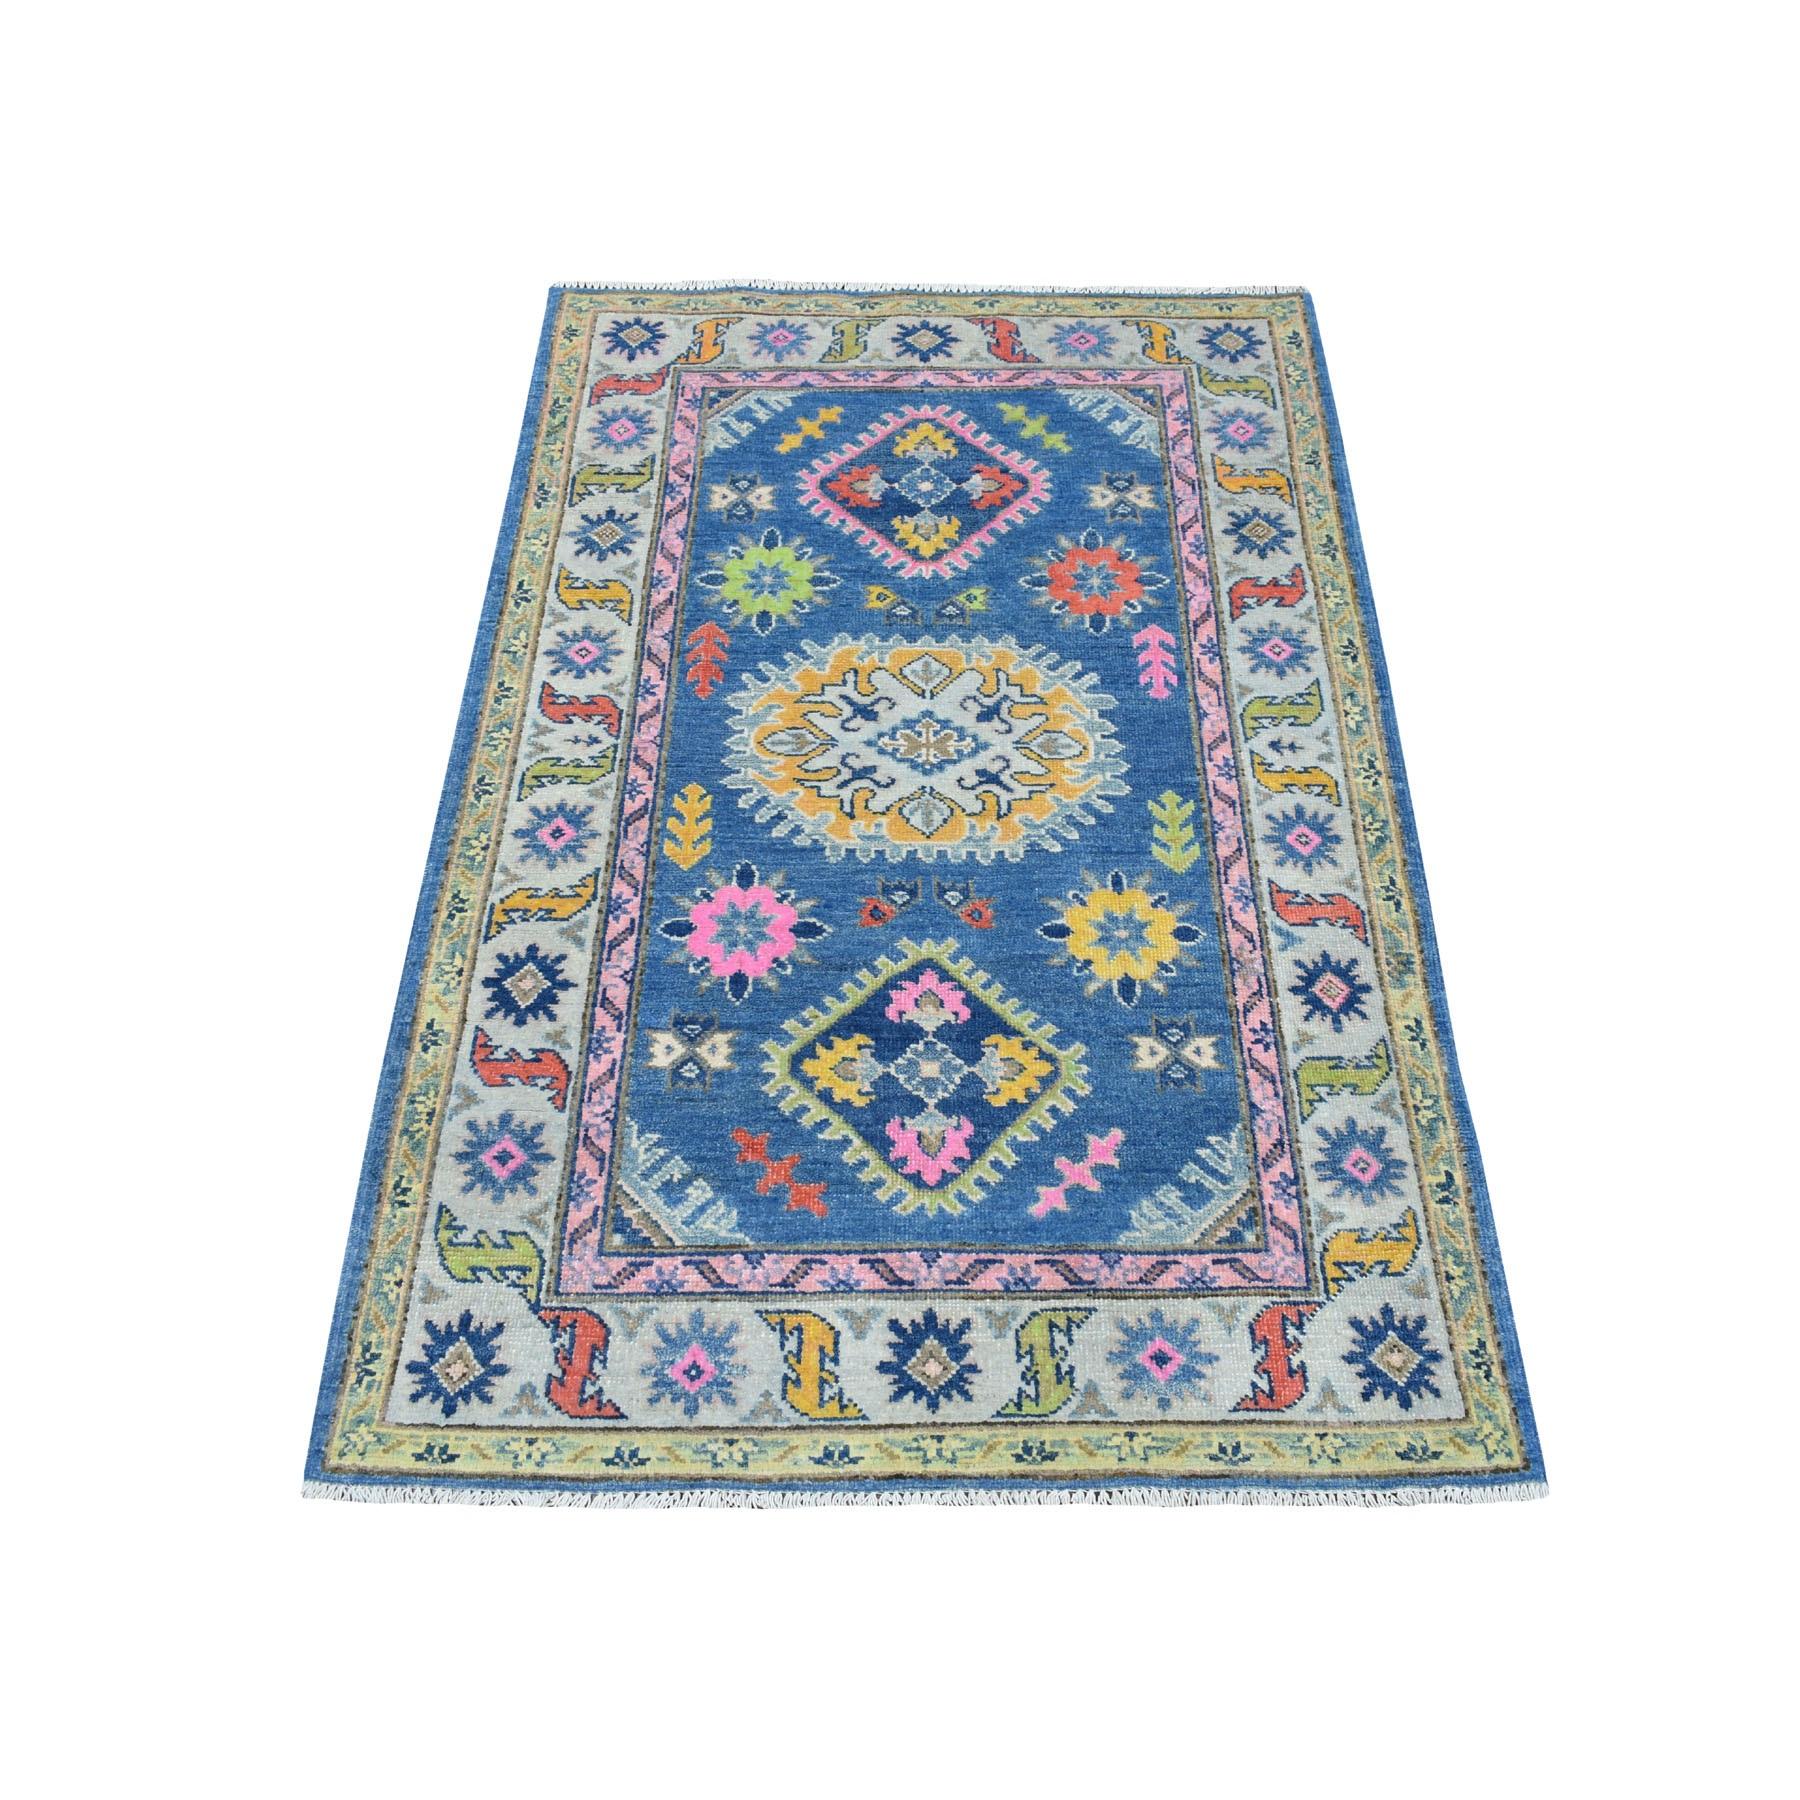 "3'3""X5' Colorful Blue Fusion Kazak Pure Wool Geometric Design Hand Knotted Oriental Rug moaedc0c"